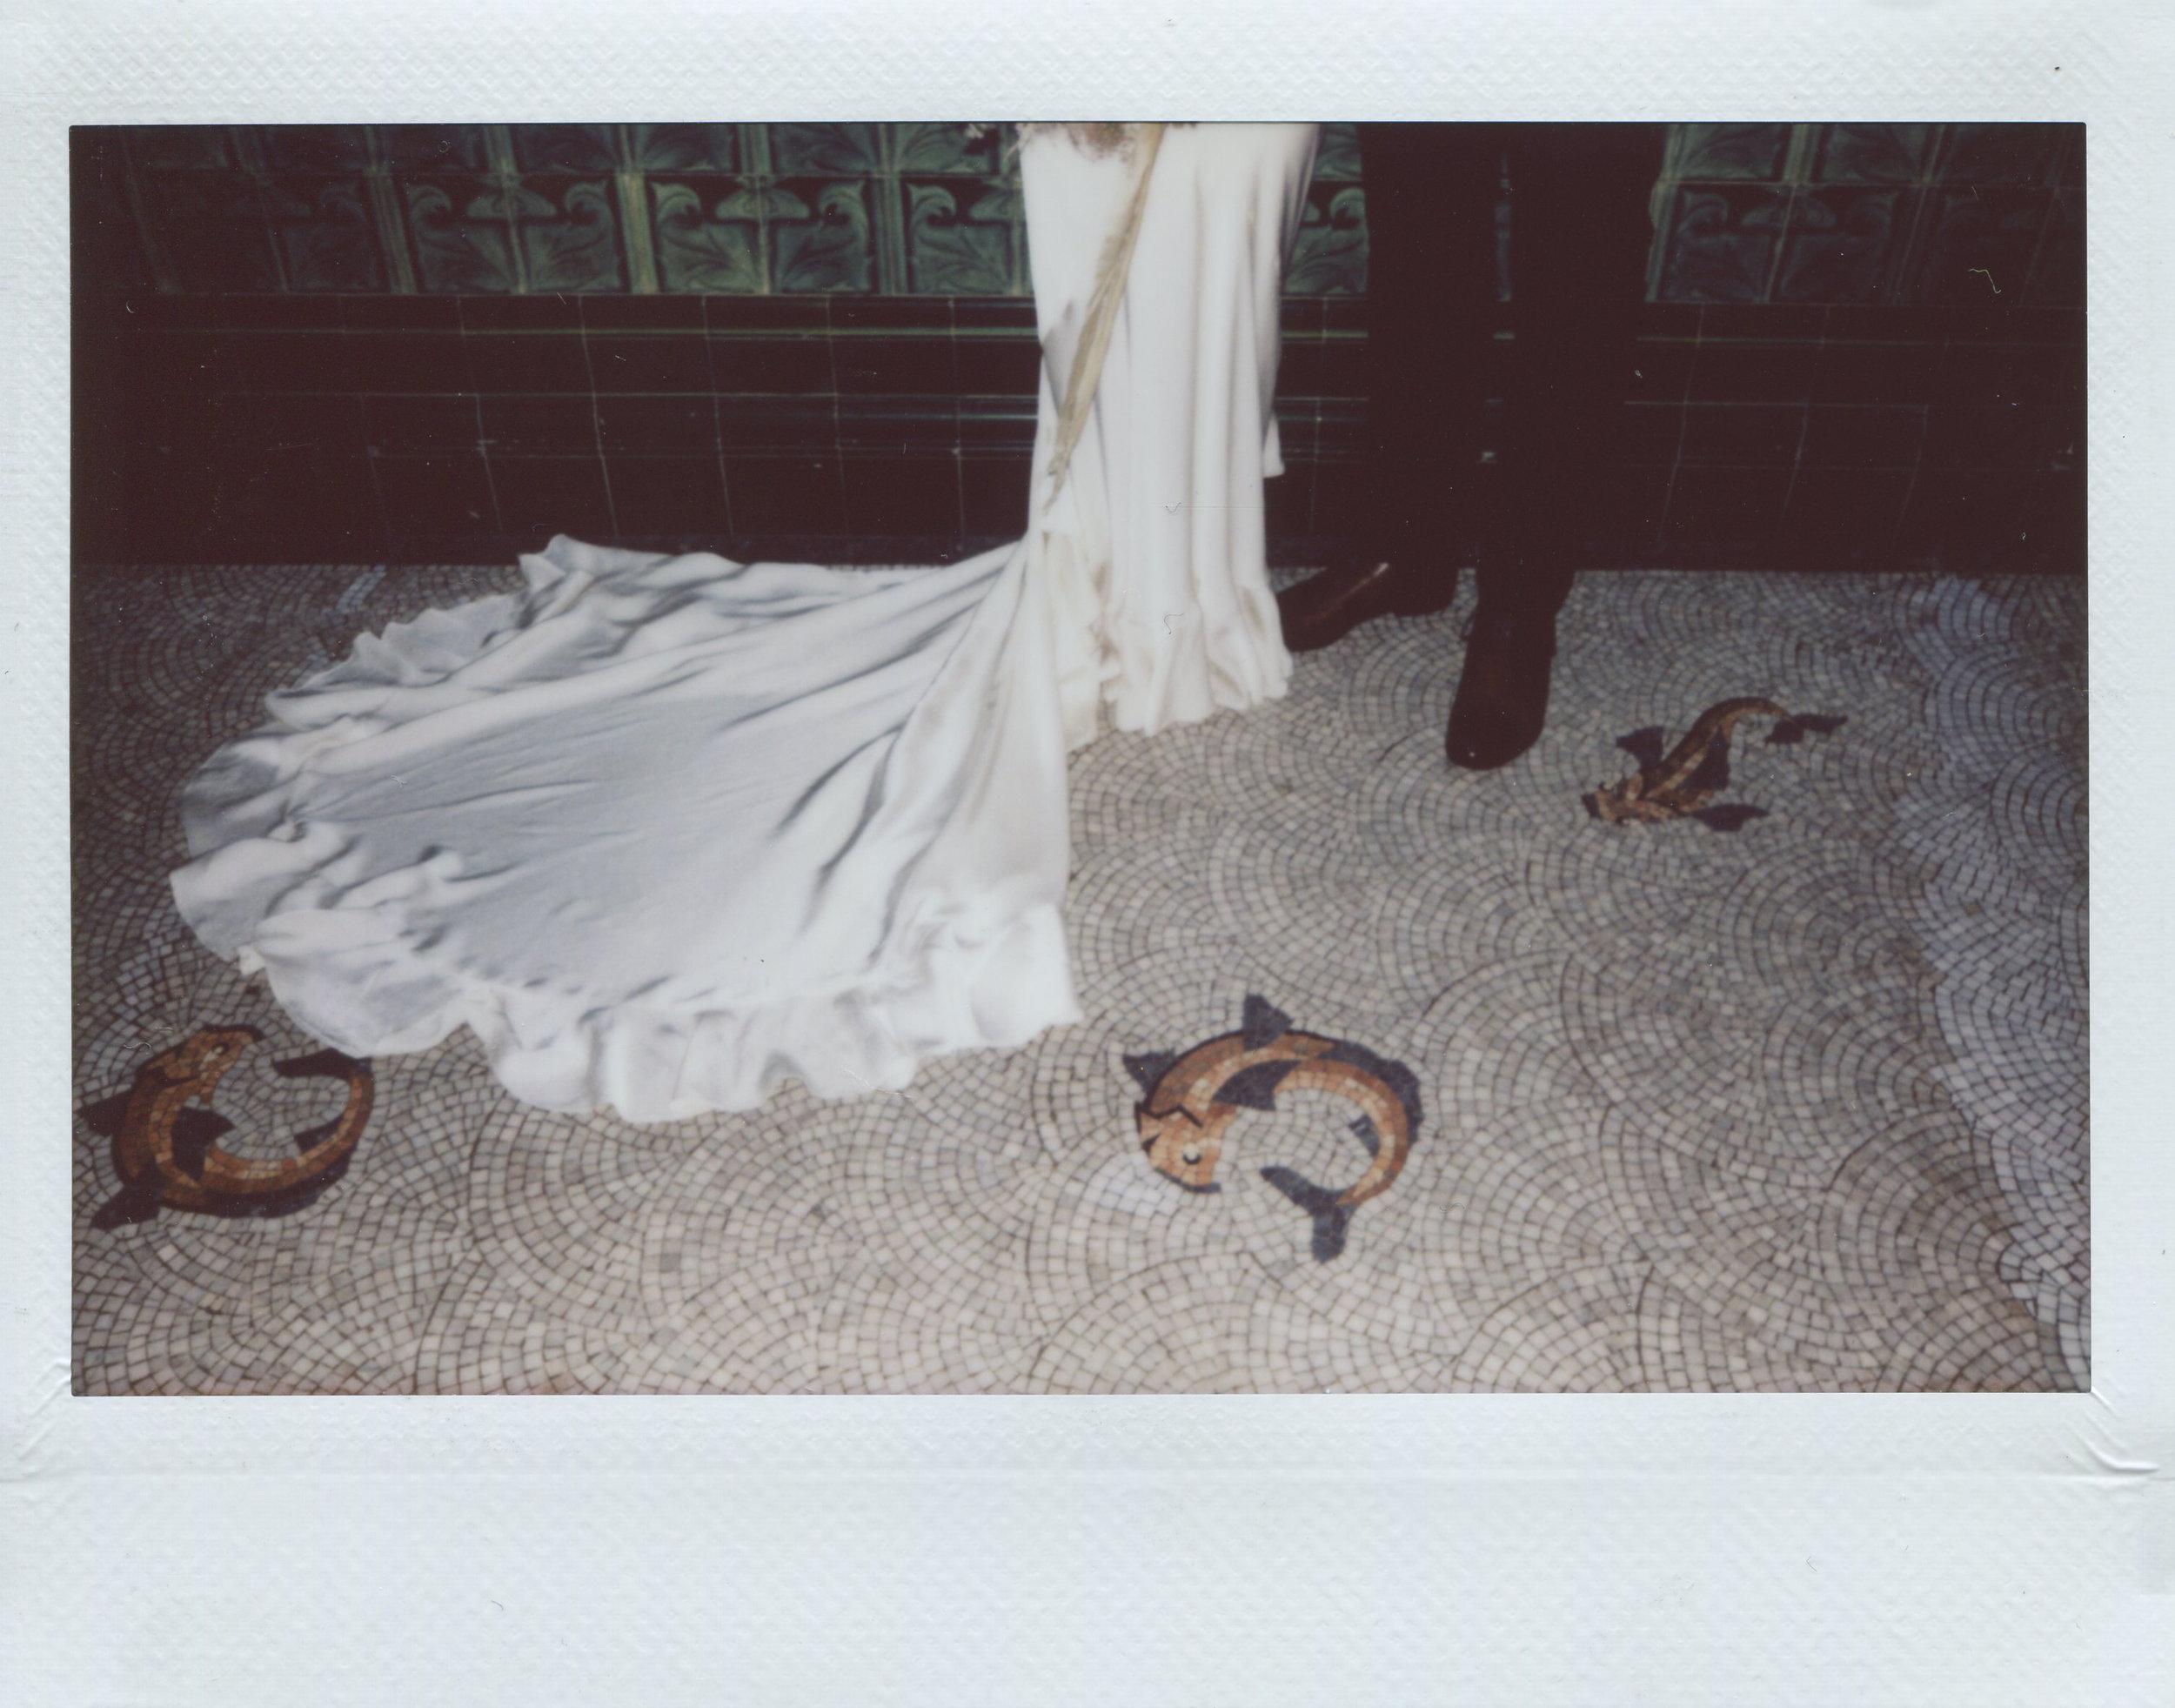 Instax wedding photographer